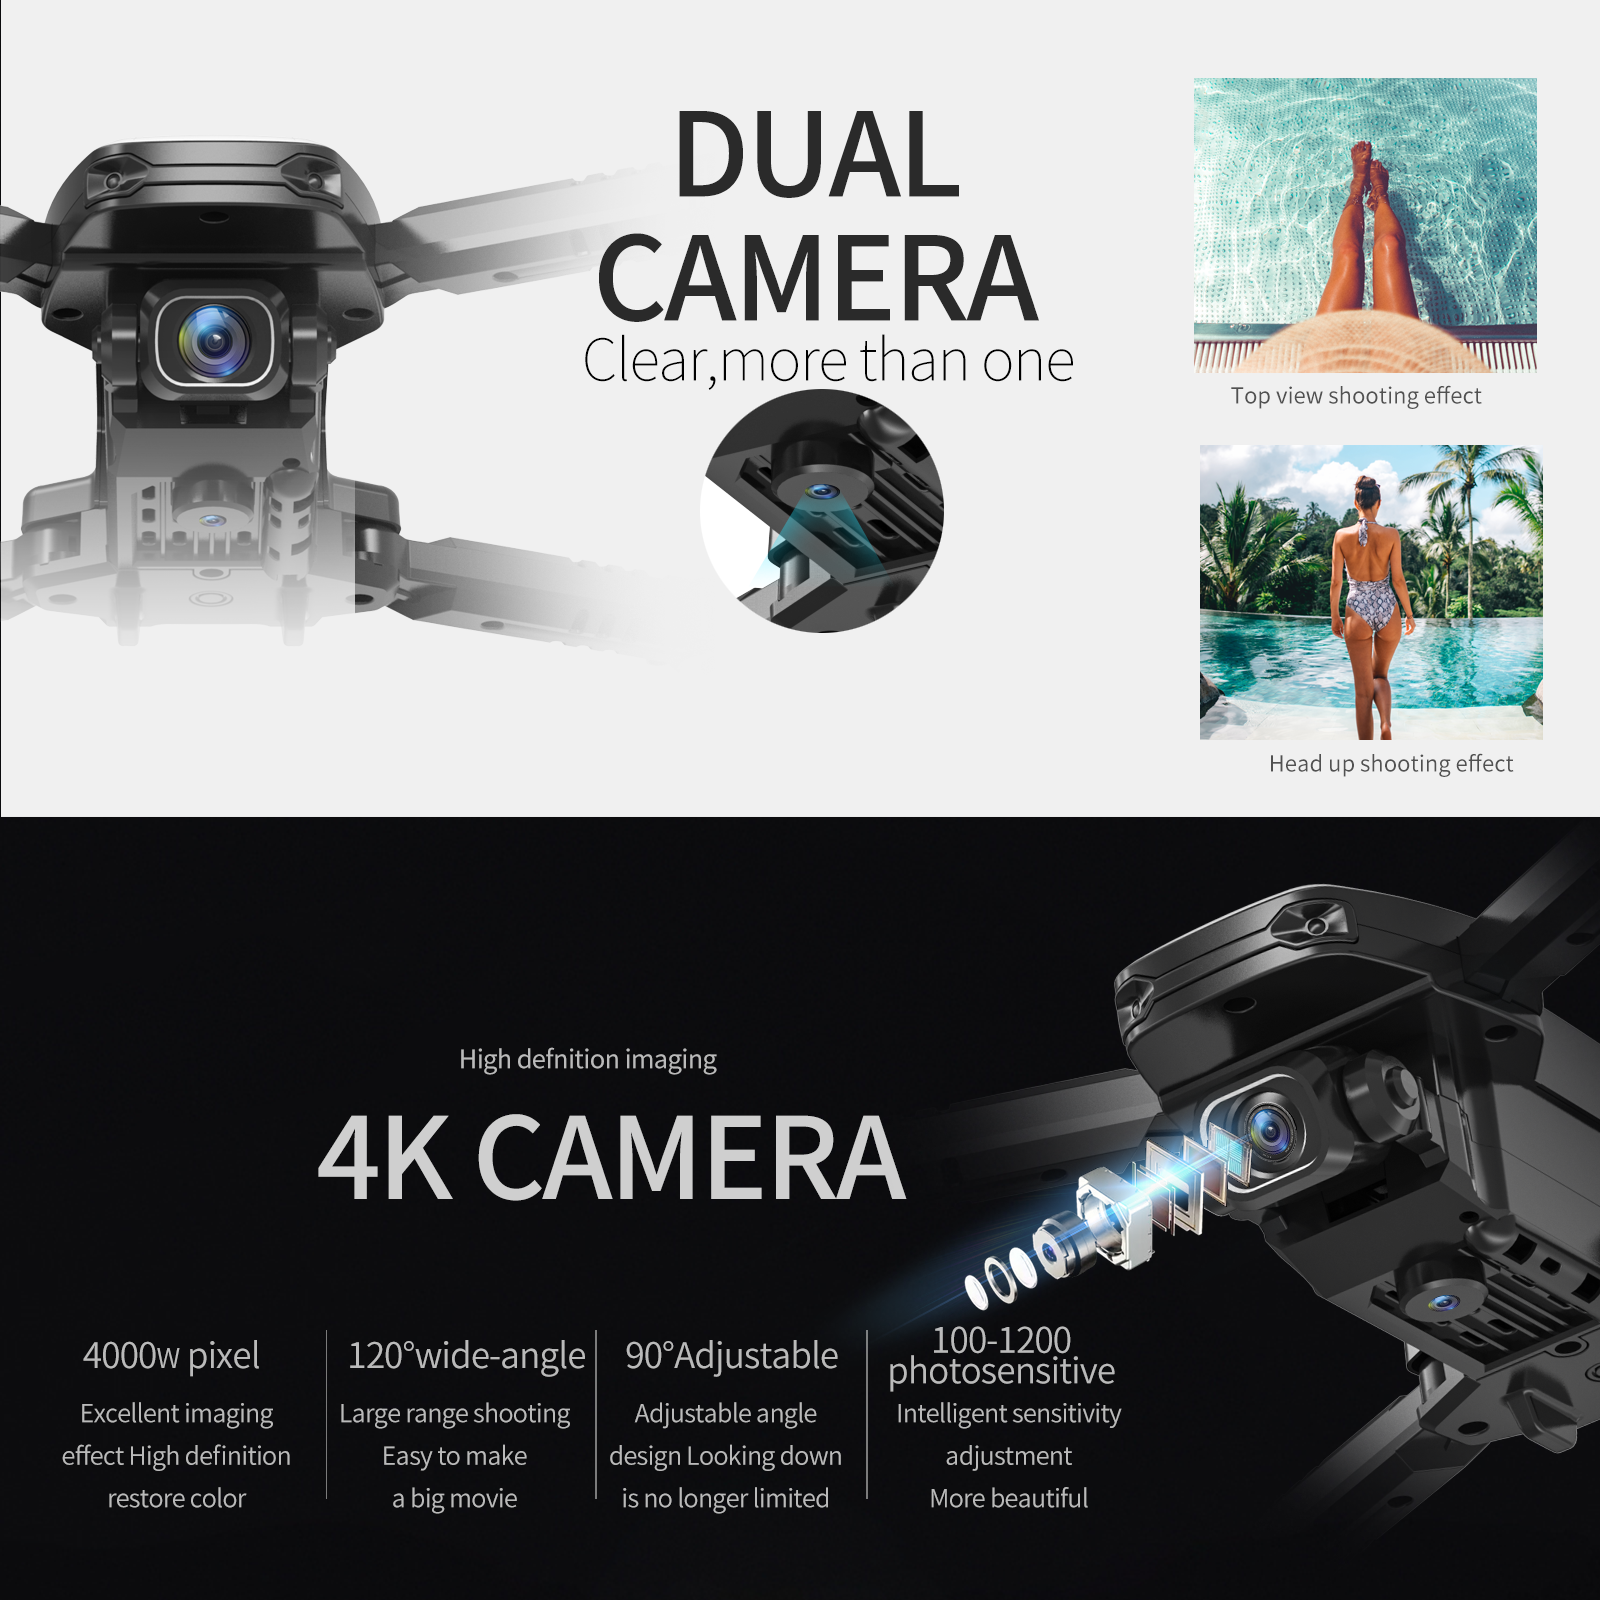 S171 برو FPV طائرات بدون طيار صغيرة 4k HD كاميرا مزدوجة الارتفاع عقد Coreless موتور واي فاي 2.4G أجهزة الاستقبال عن بعد طوي بدون طيار كاميرات بدون طيار